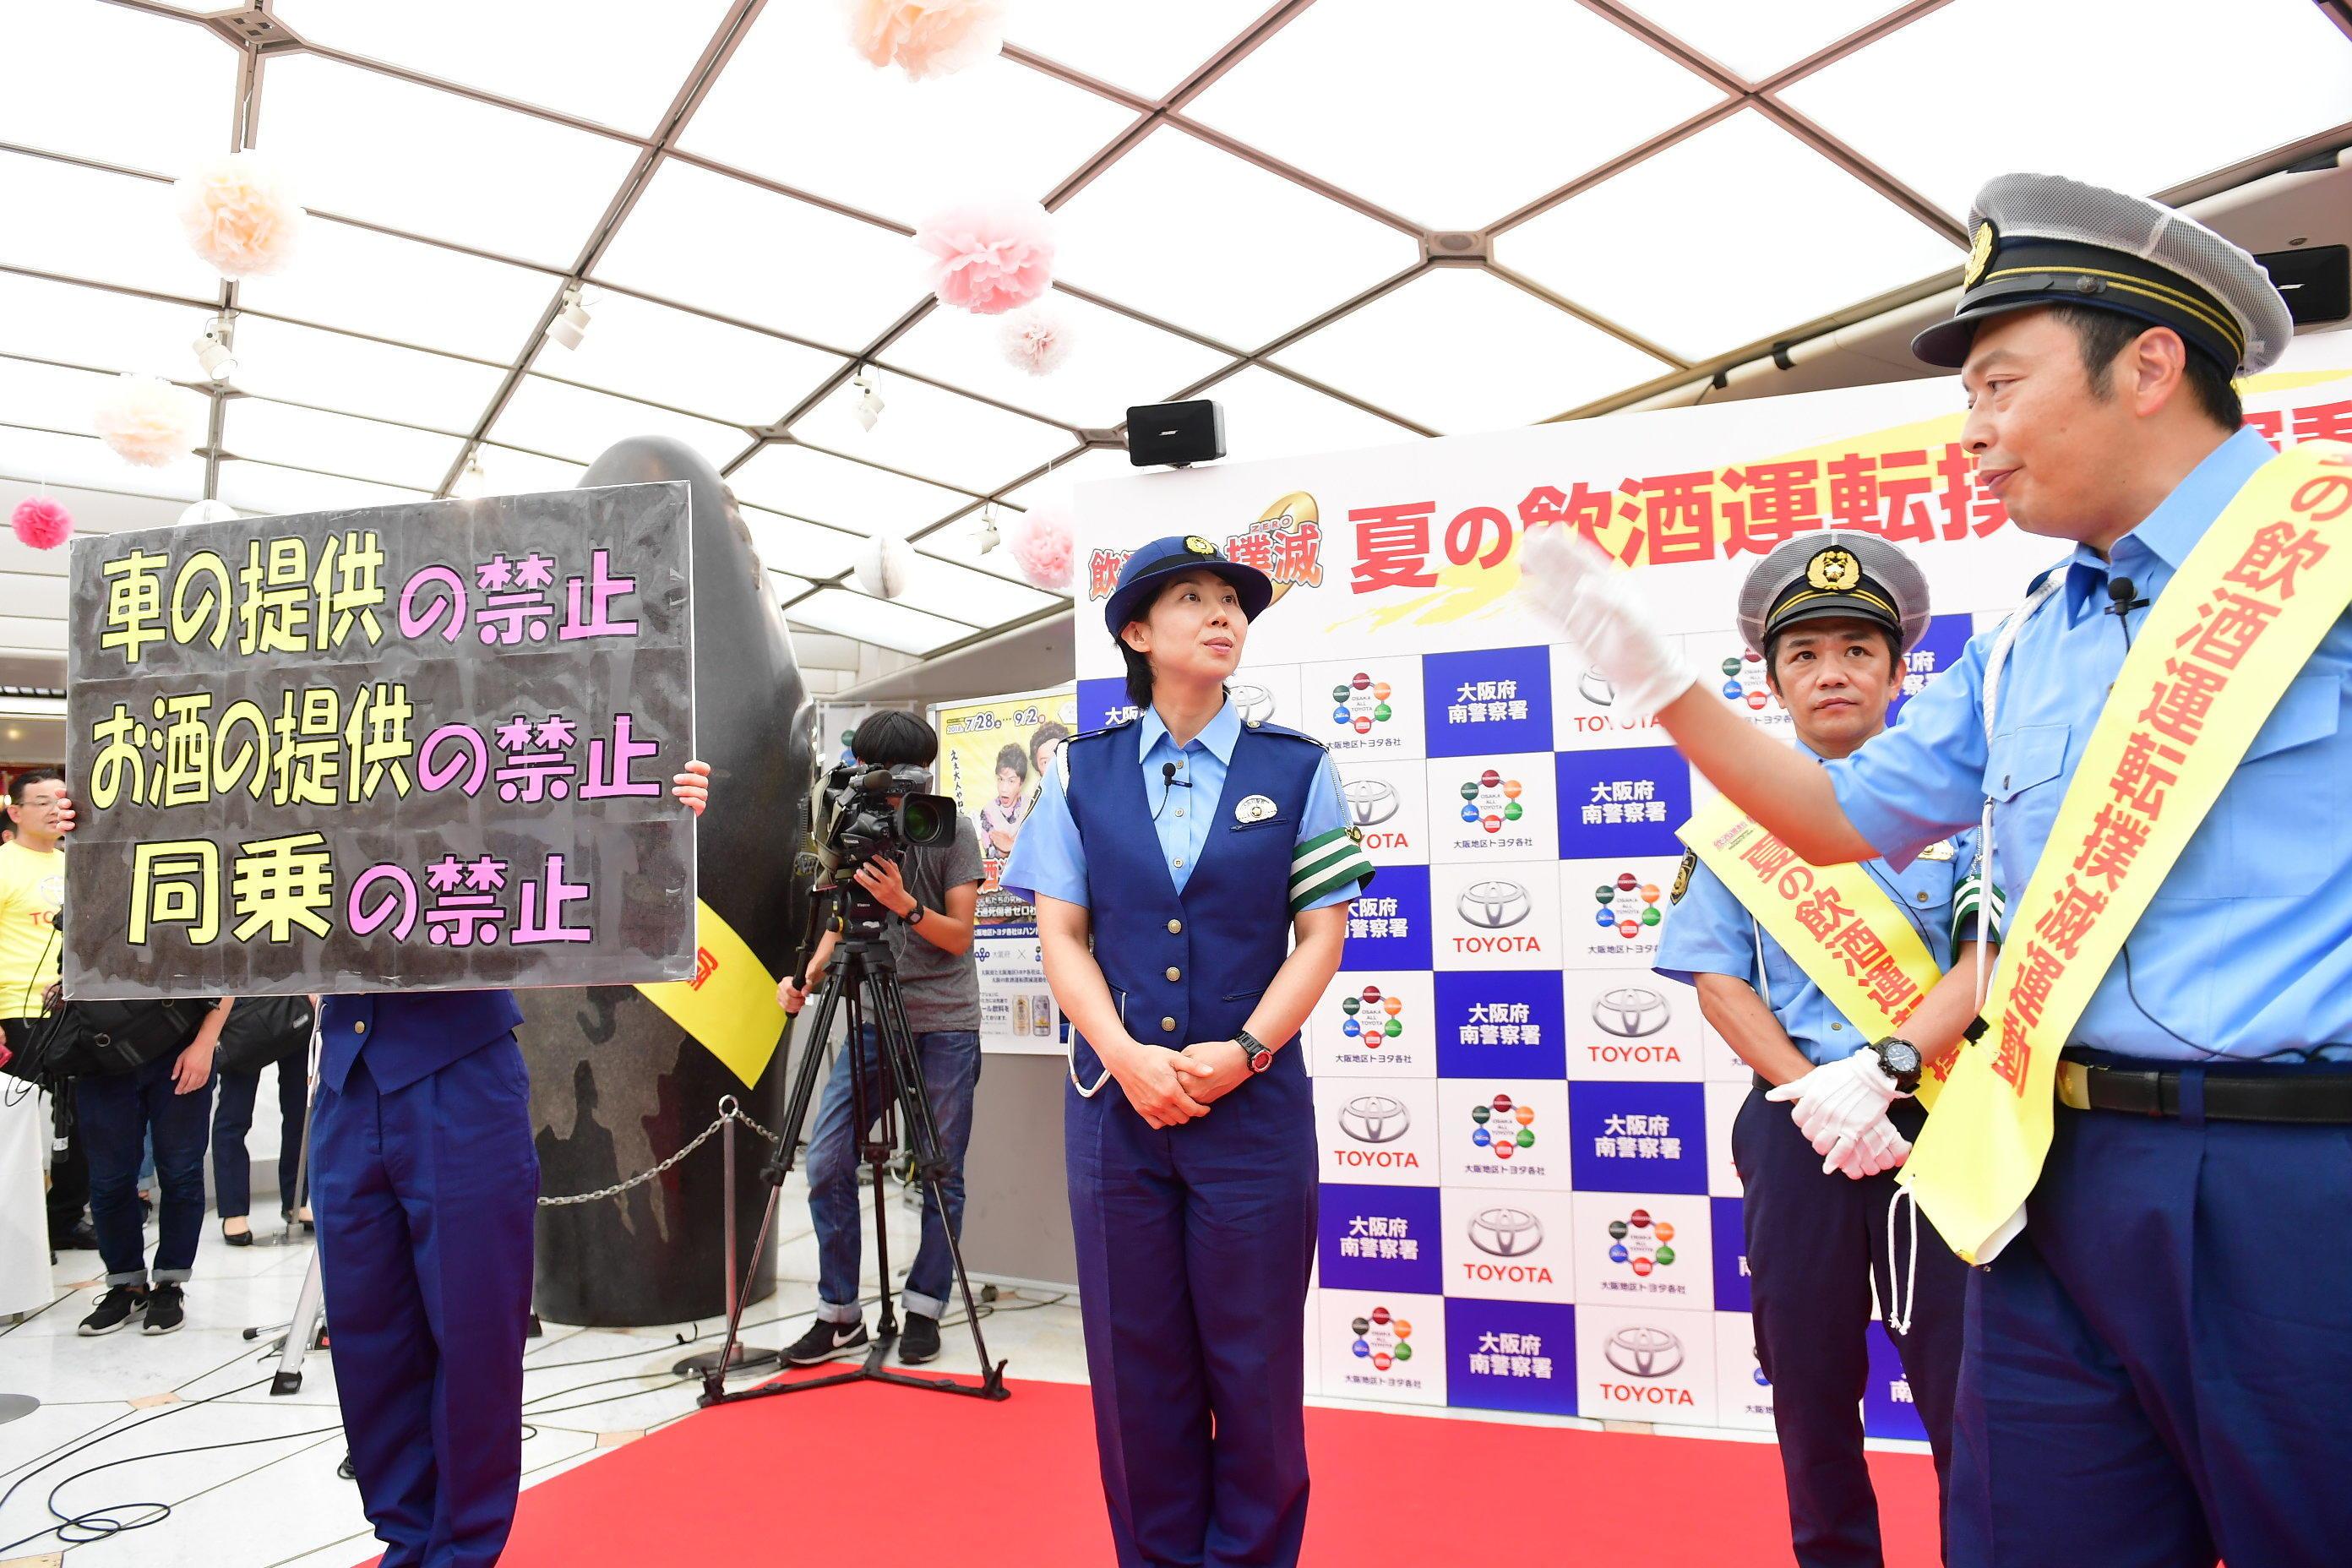 http://news.yoshimoto.co.jp/20180727201844-052248cf962684abbaa03c8084f7194978ec15b7.jpg